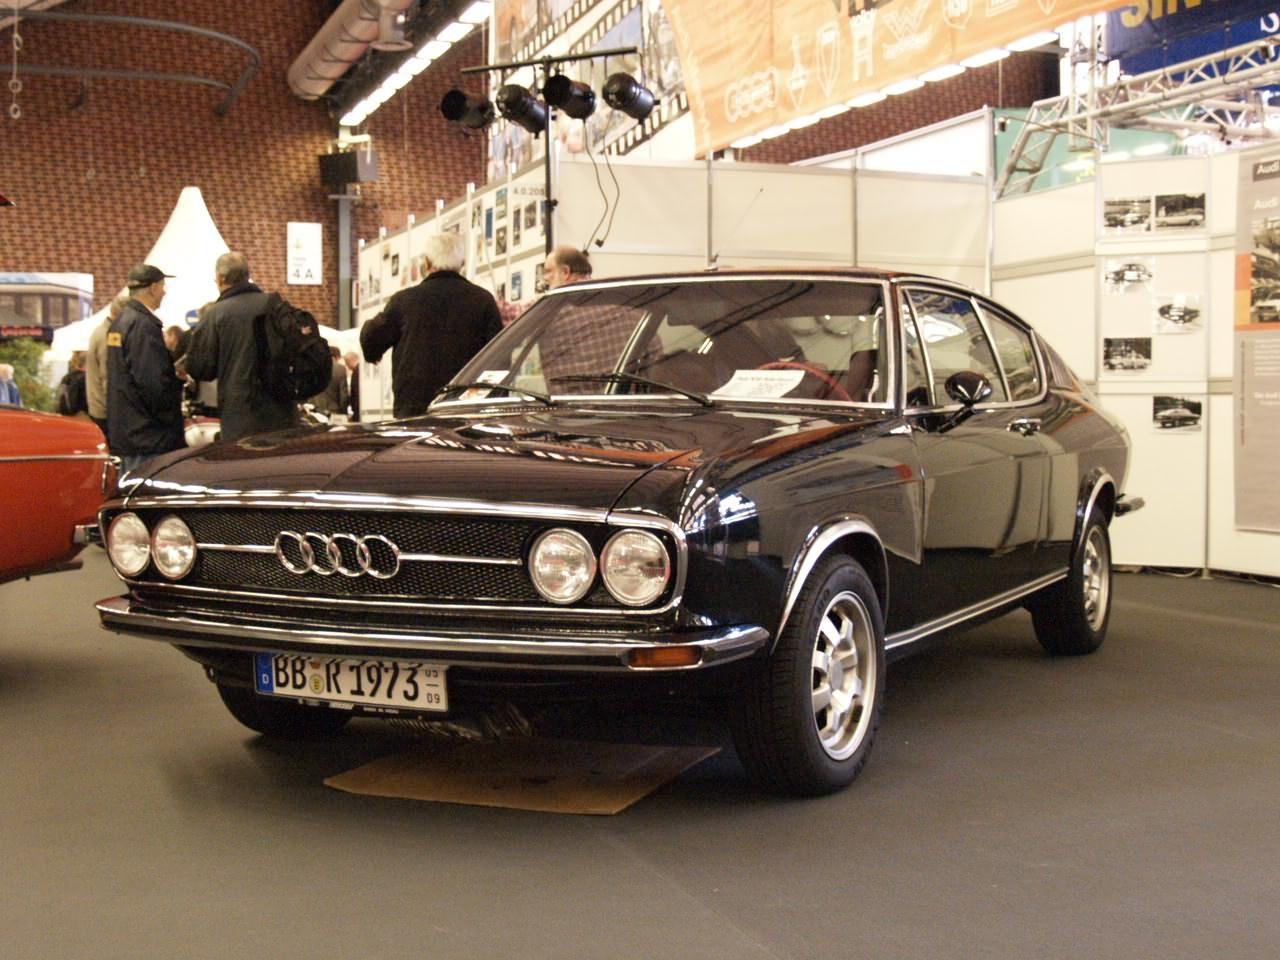 audi 100 s coupe (c1) (1969—1975)